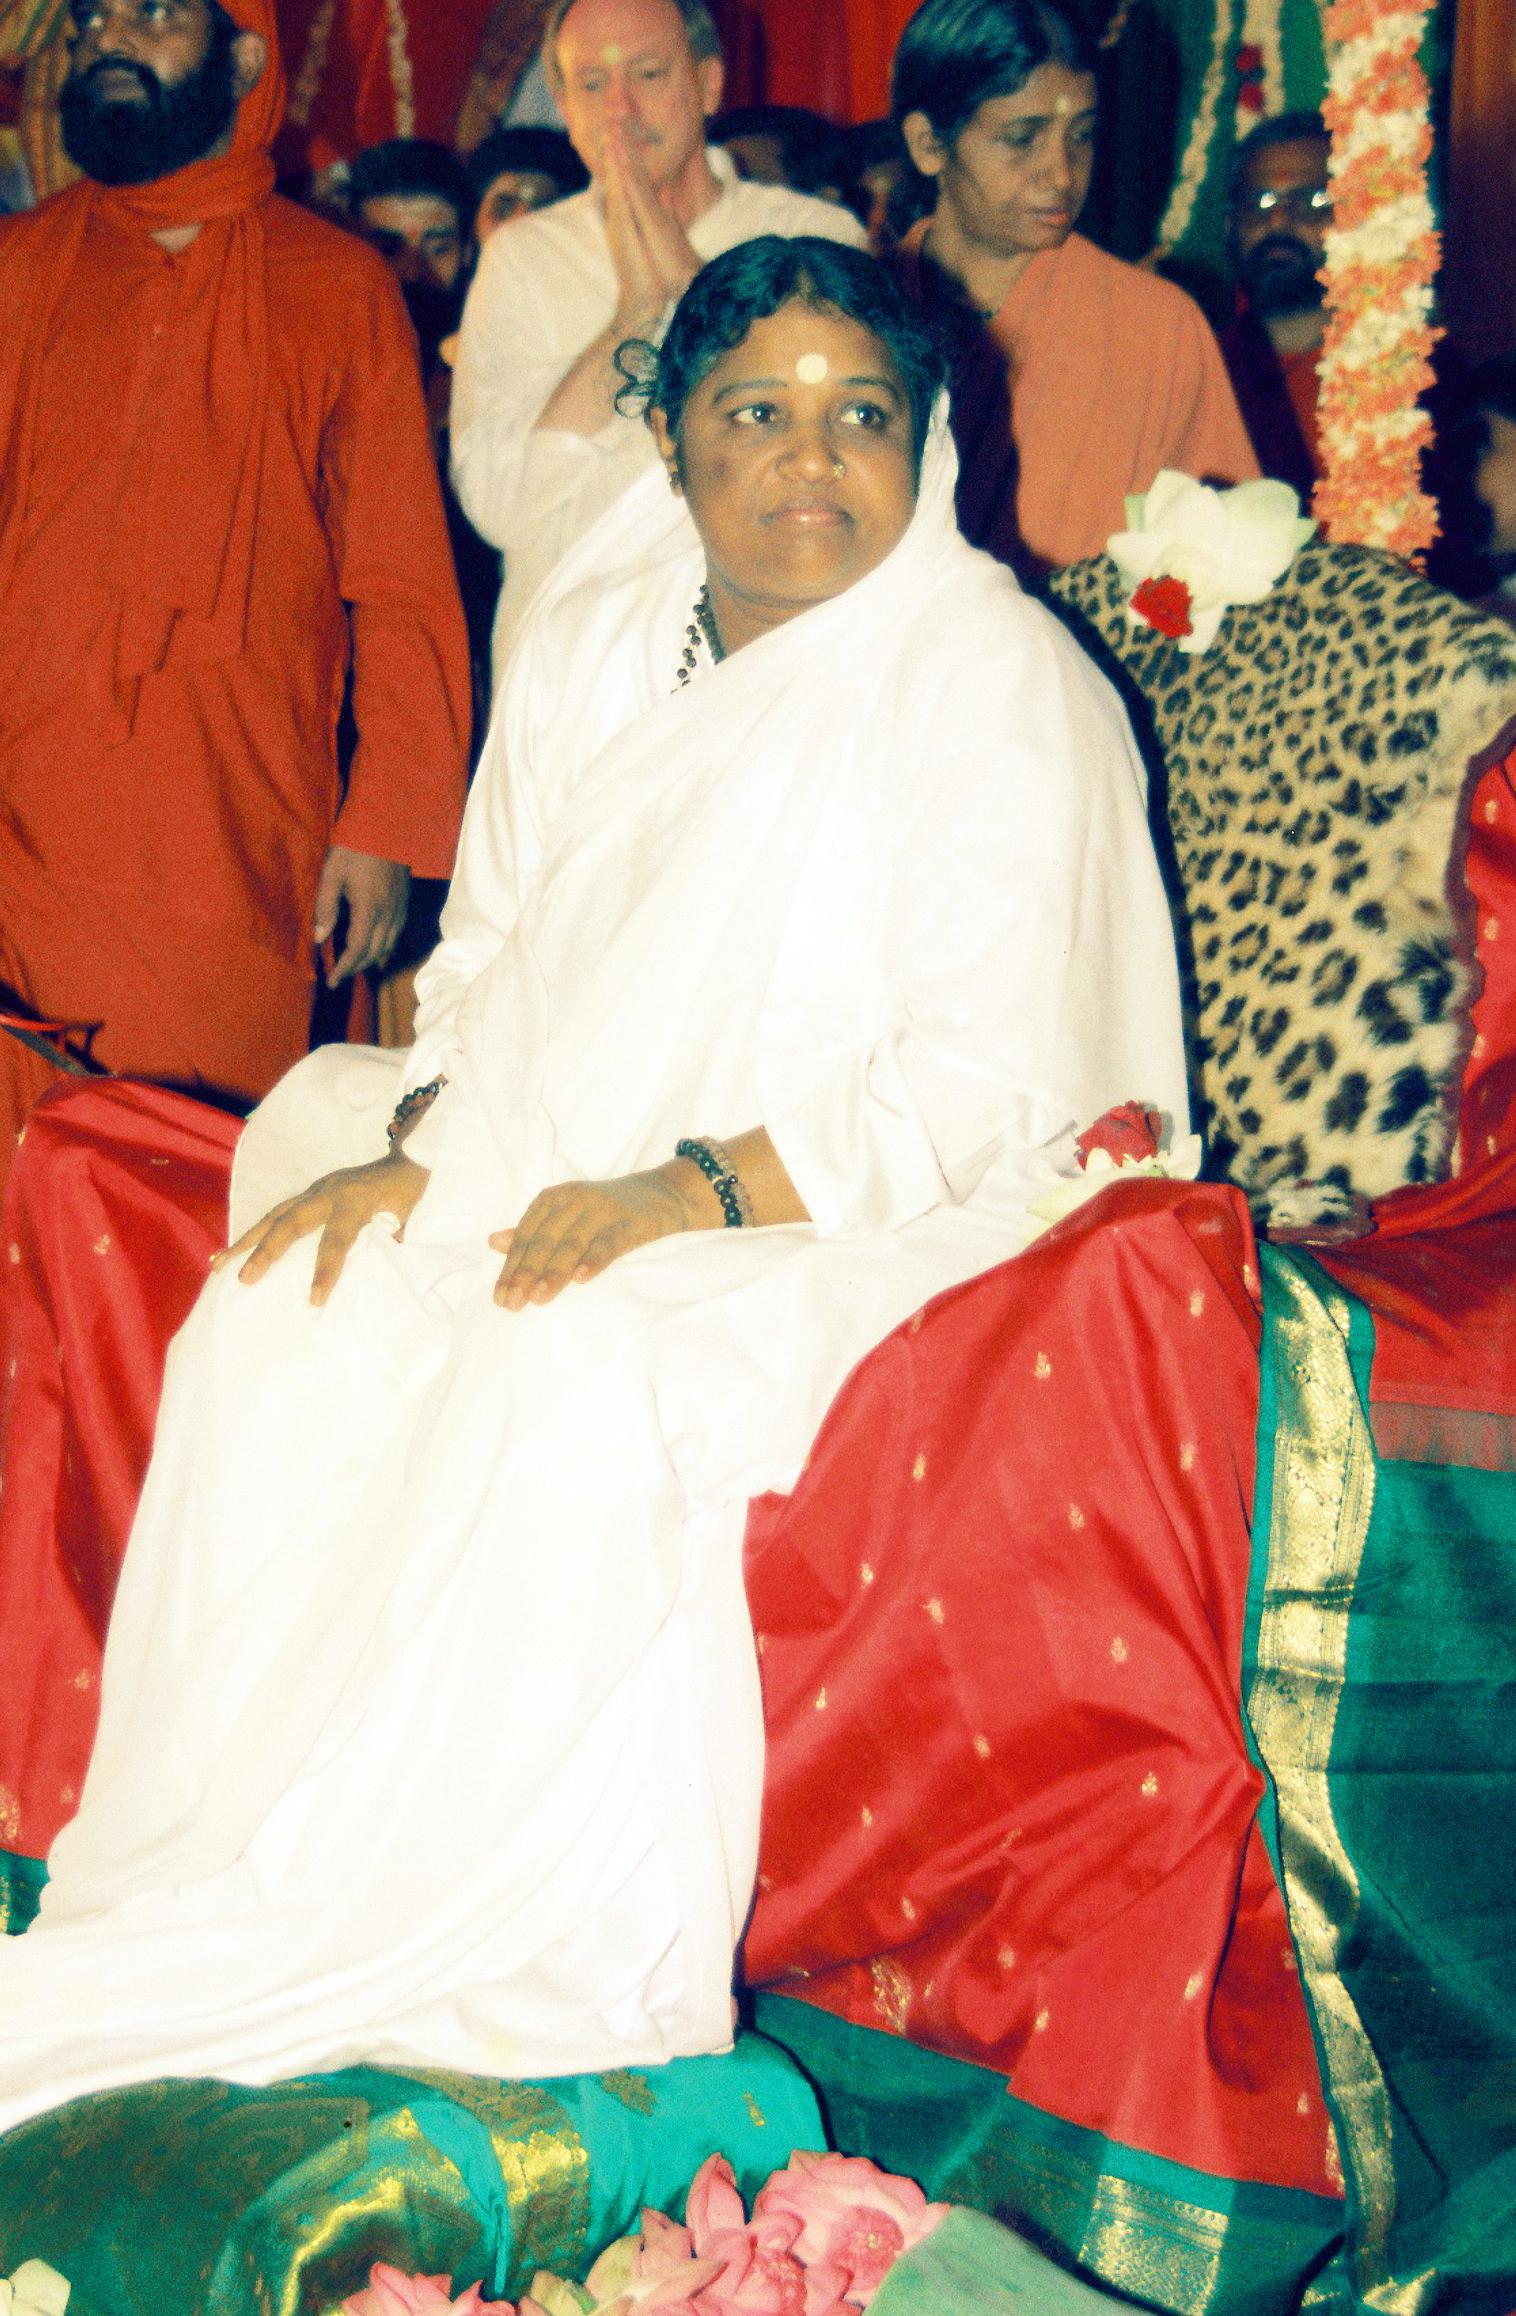 Mata Amritanandamayi of Amritapuri Ashram